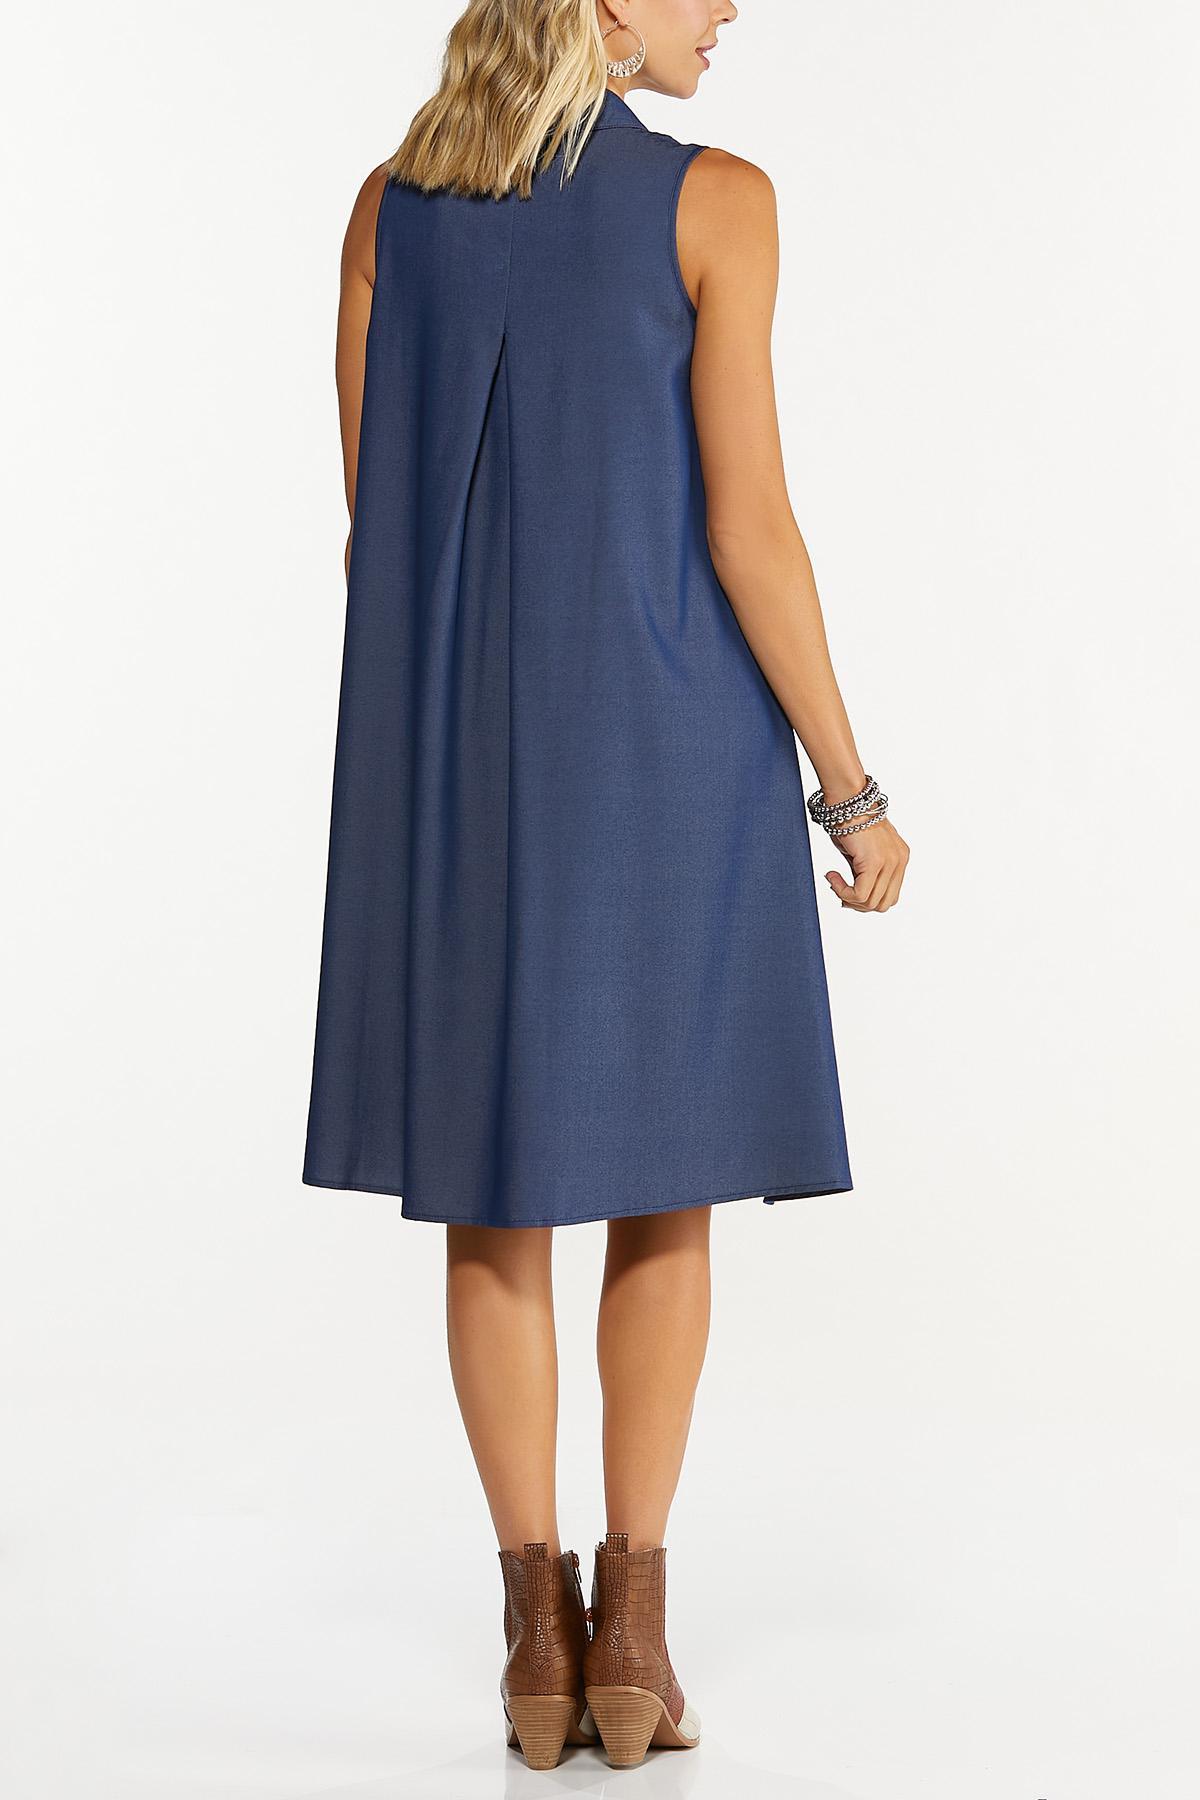 Chambray Swing Dress (Item #44707906)